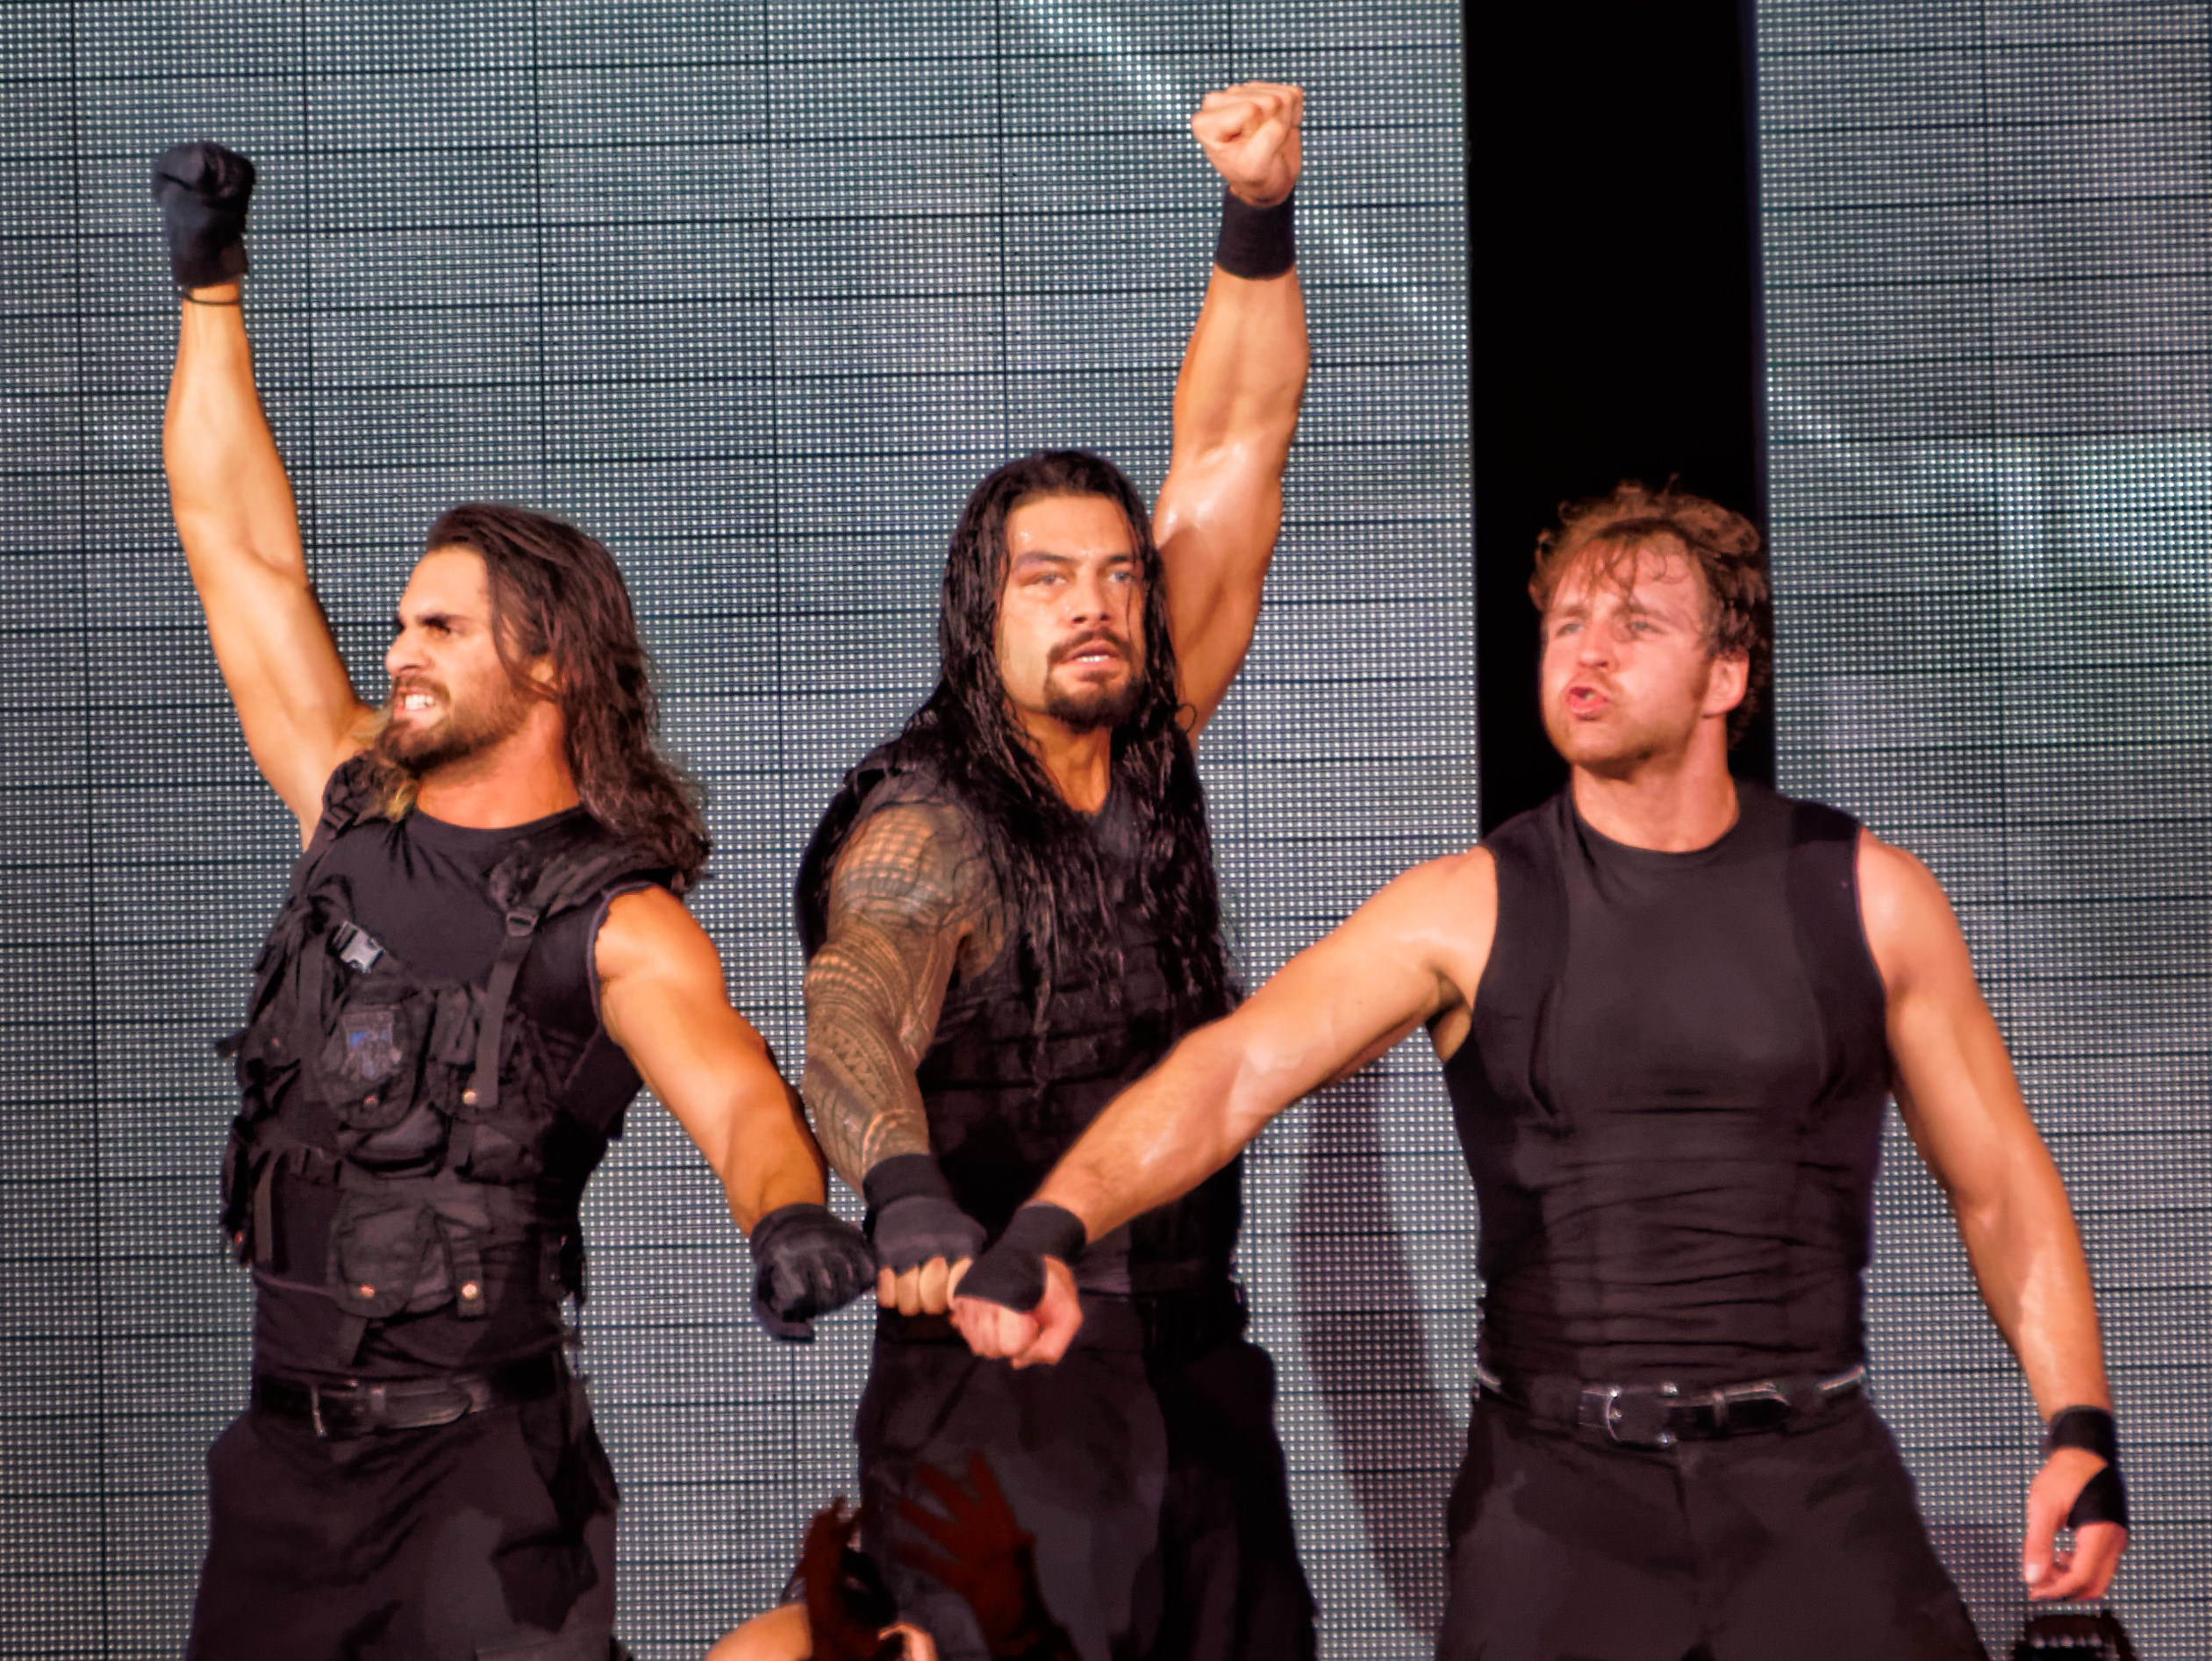 The_Shield's_fist_pose